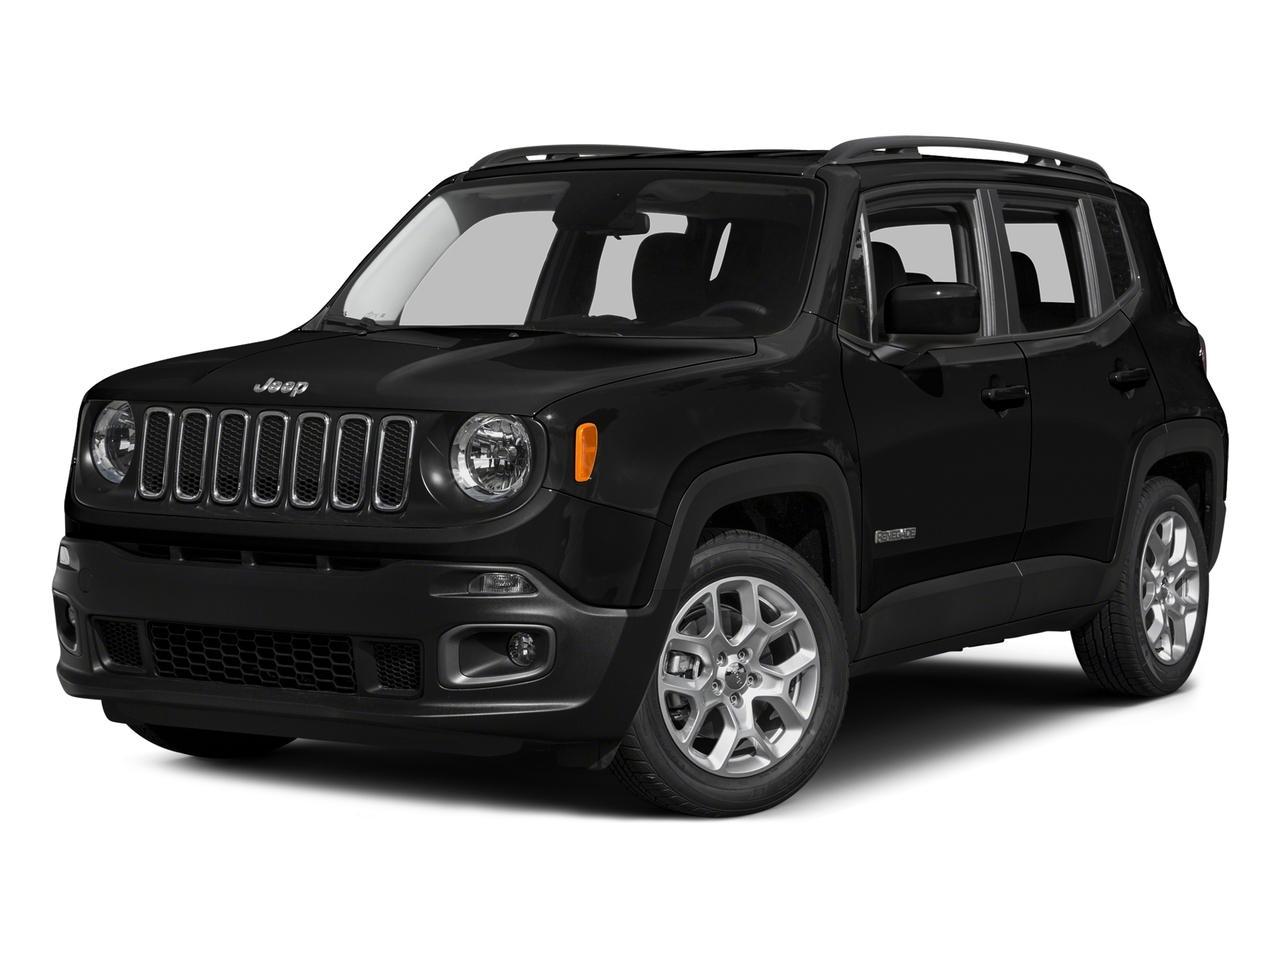 2015 Jeep Renegade Vehicle Photo in San Antonio, TX 78238